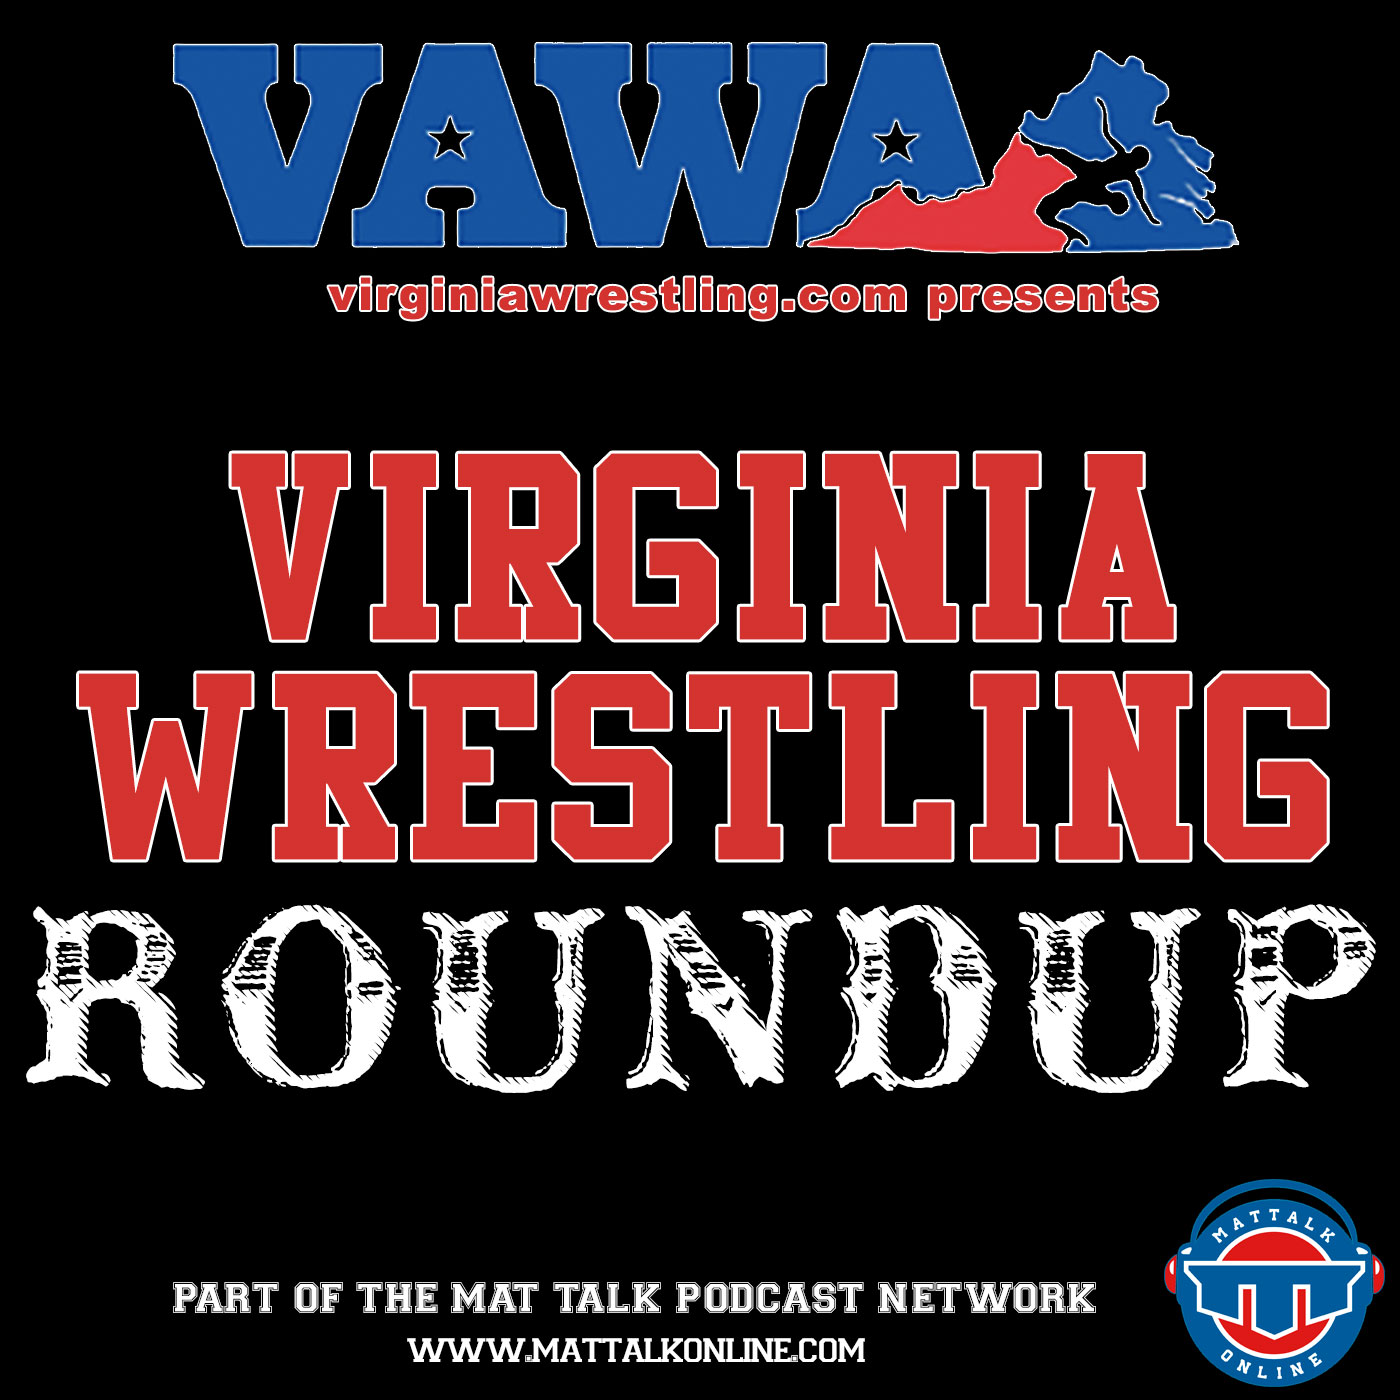 Virginia Wrestling Roundup | Mat Talk Podcast Network